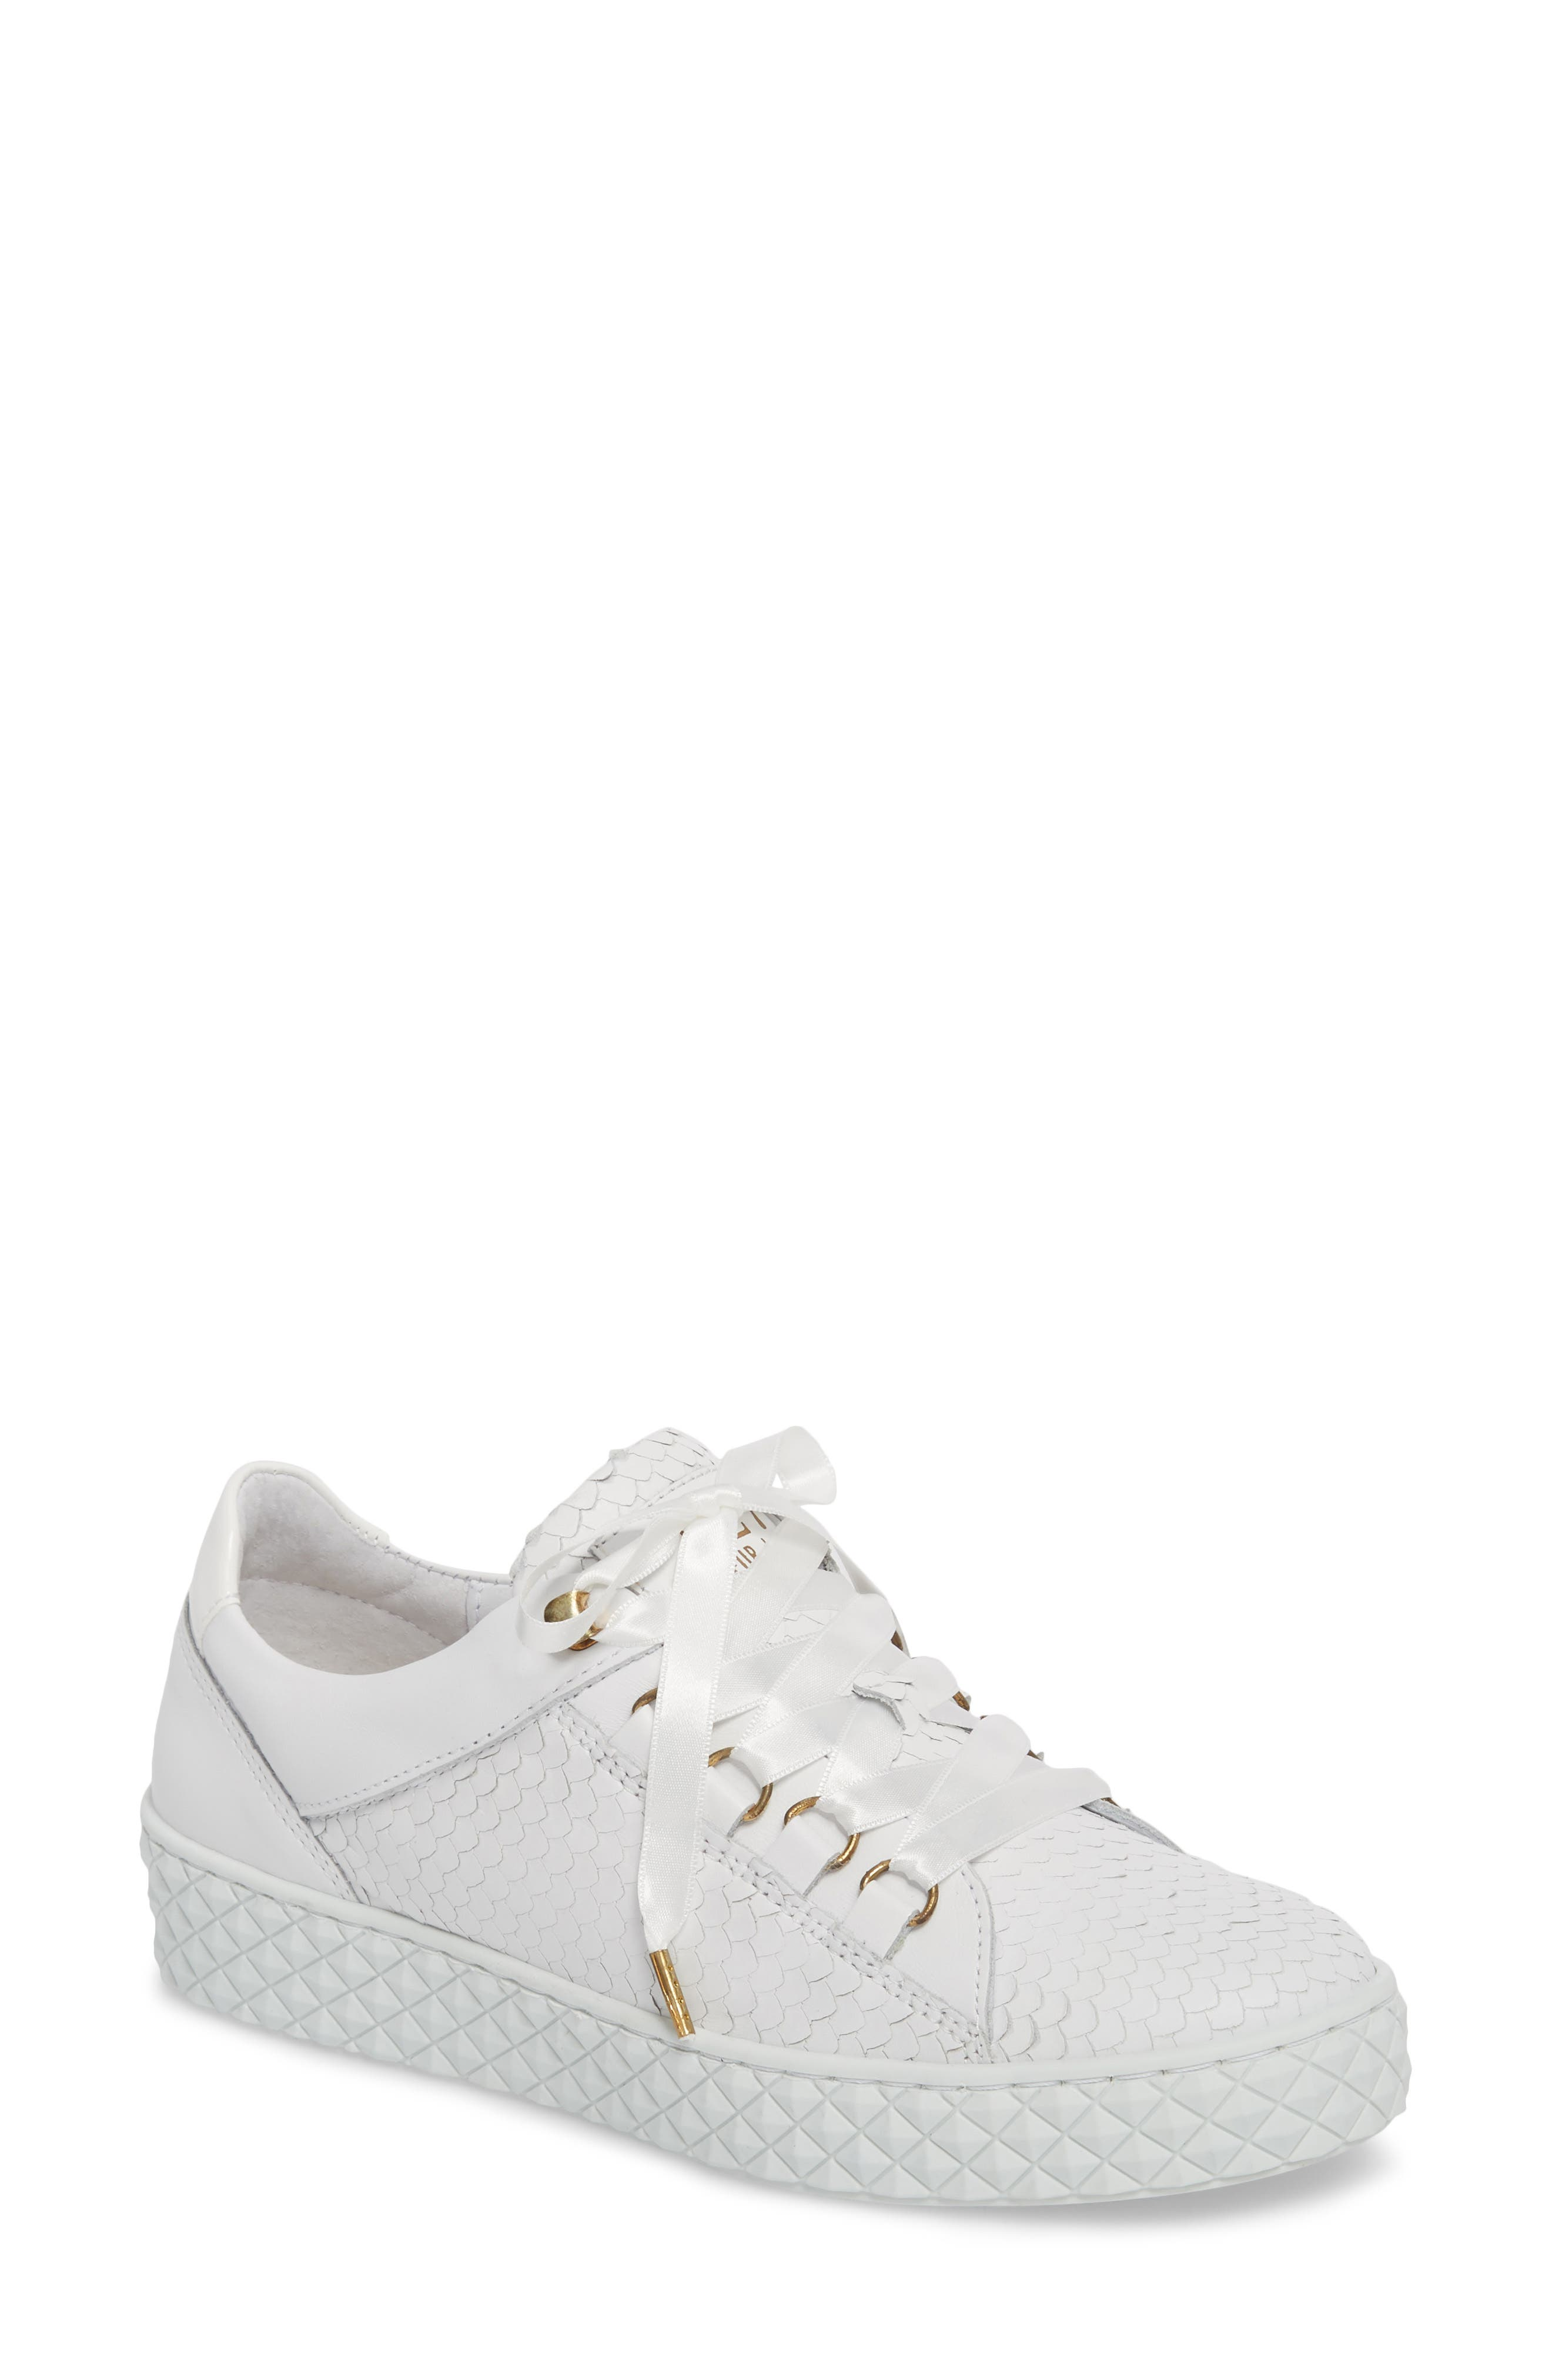 Seoul Sneaker,                         Main,                         color, Optic White Leather